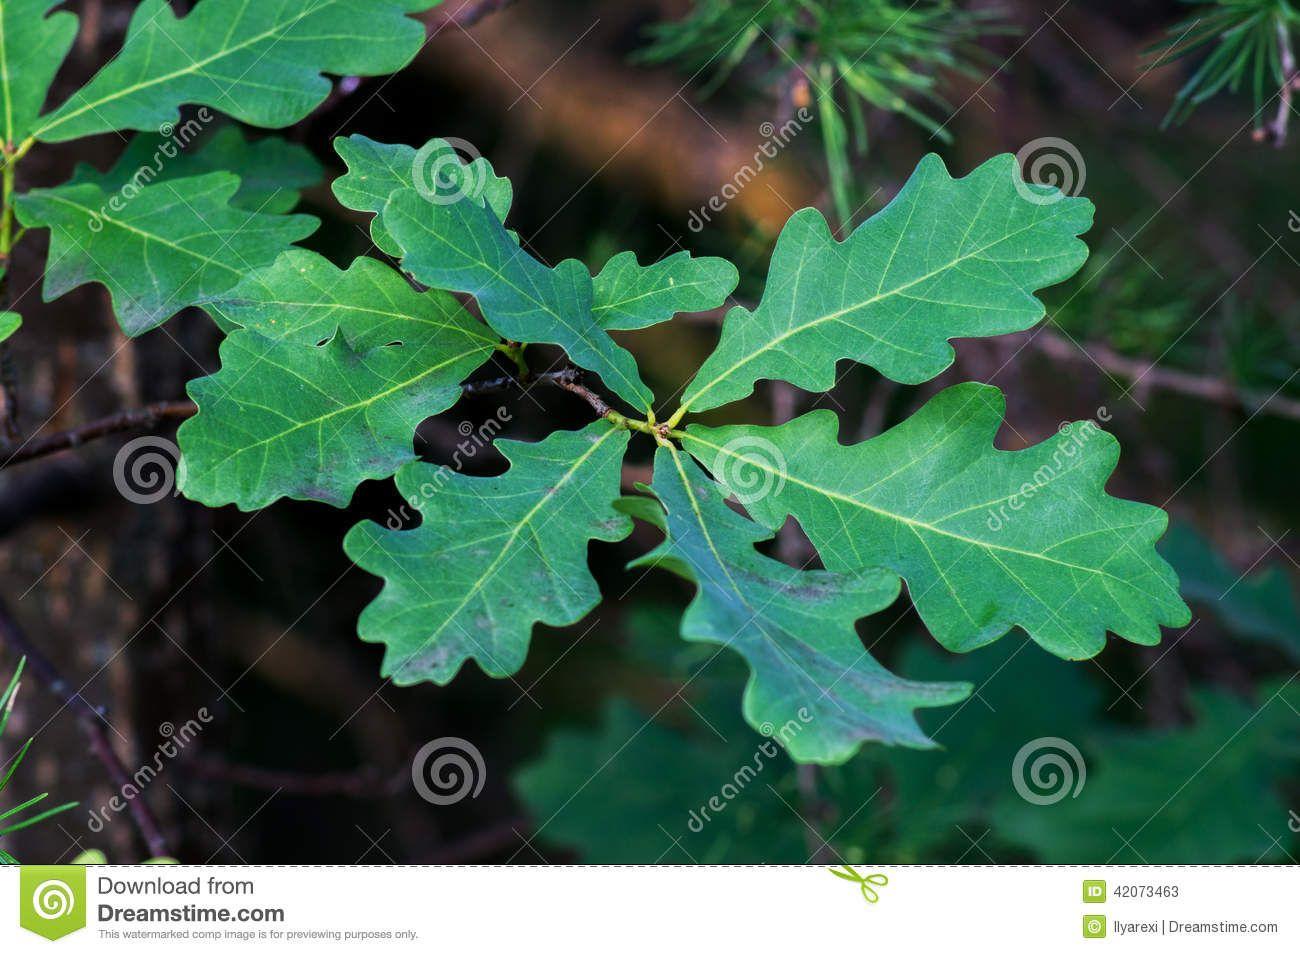 Dreamstime Comp image instructions Plant leaves